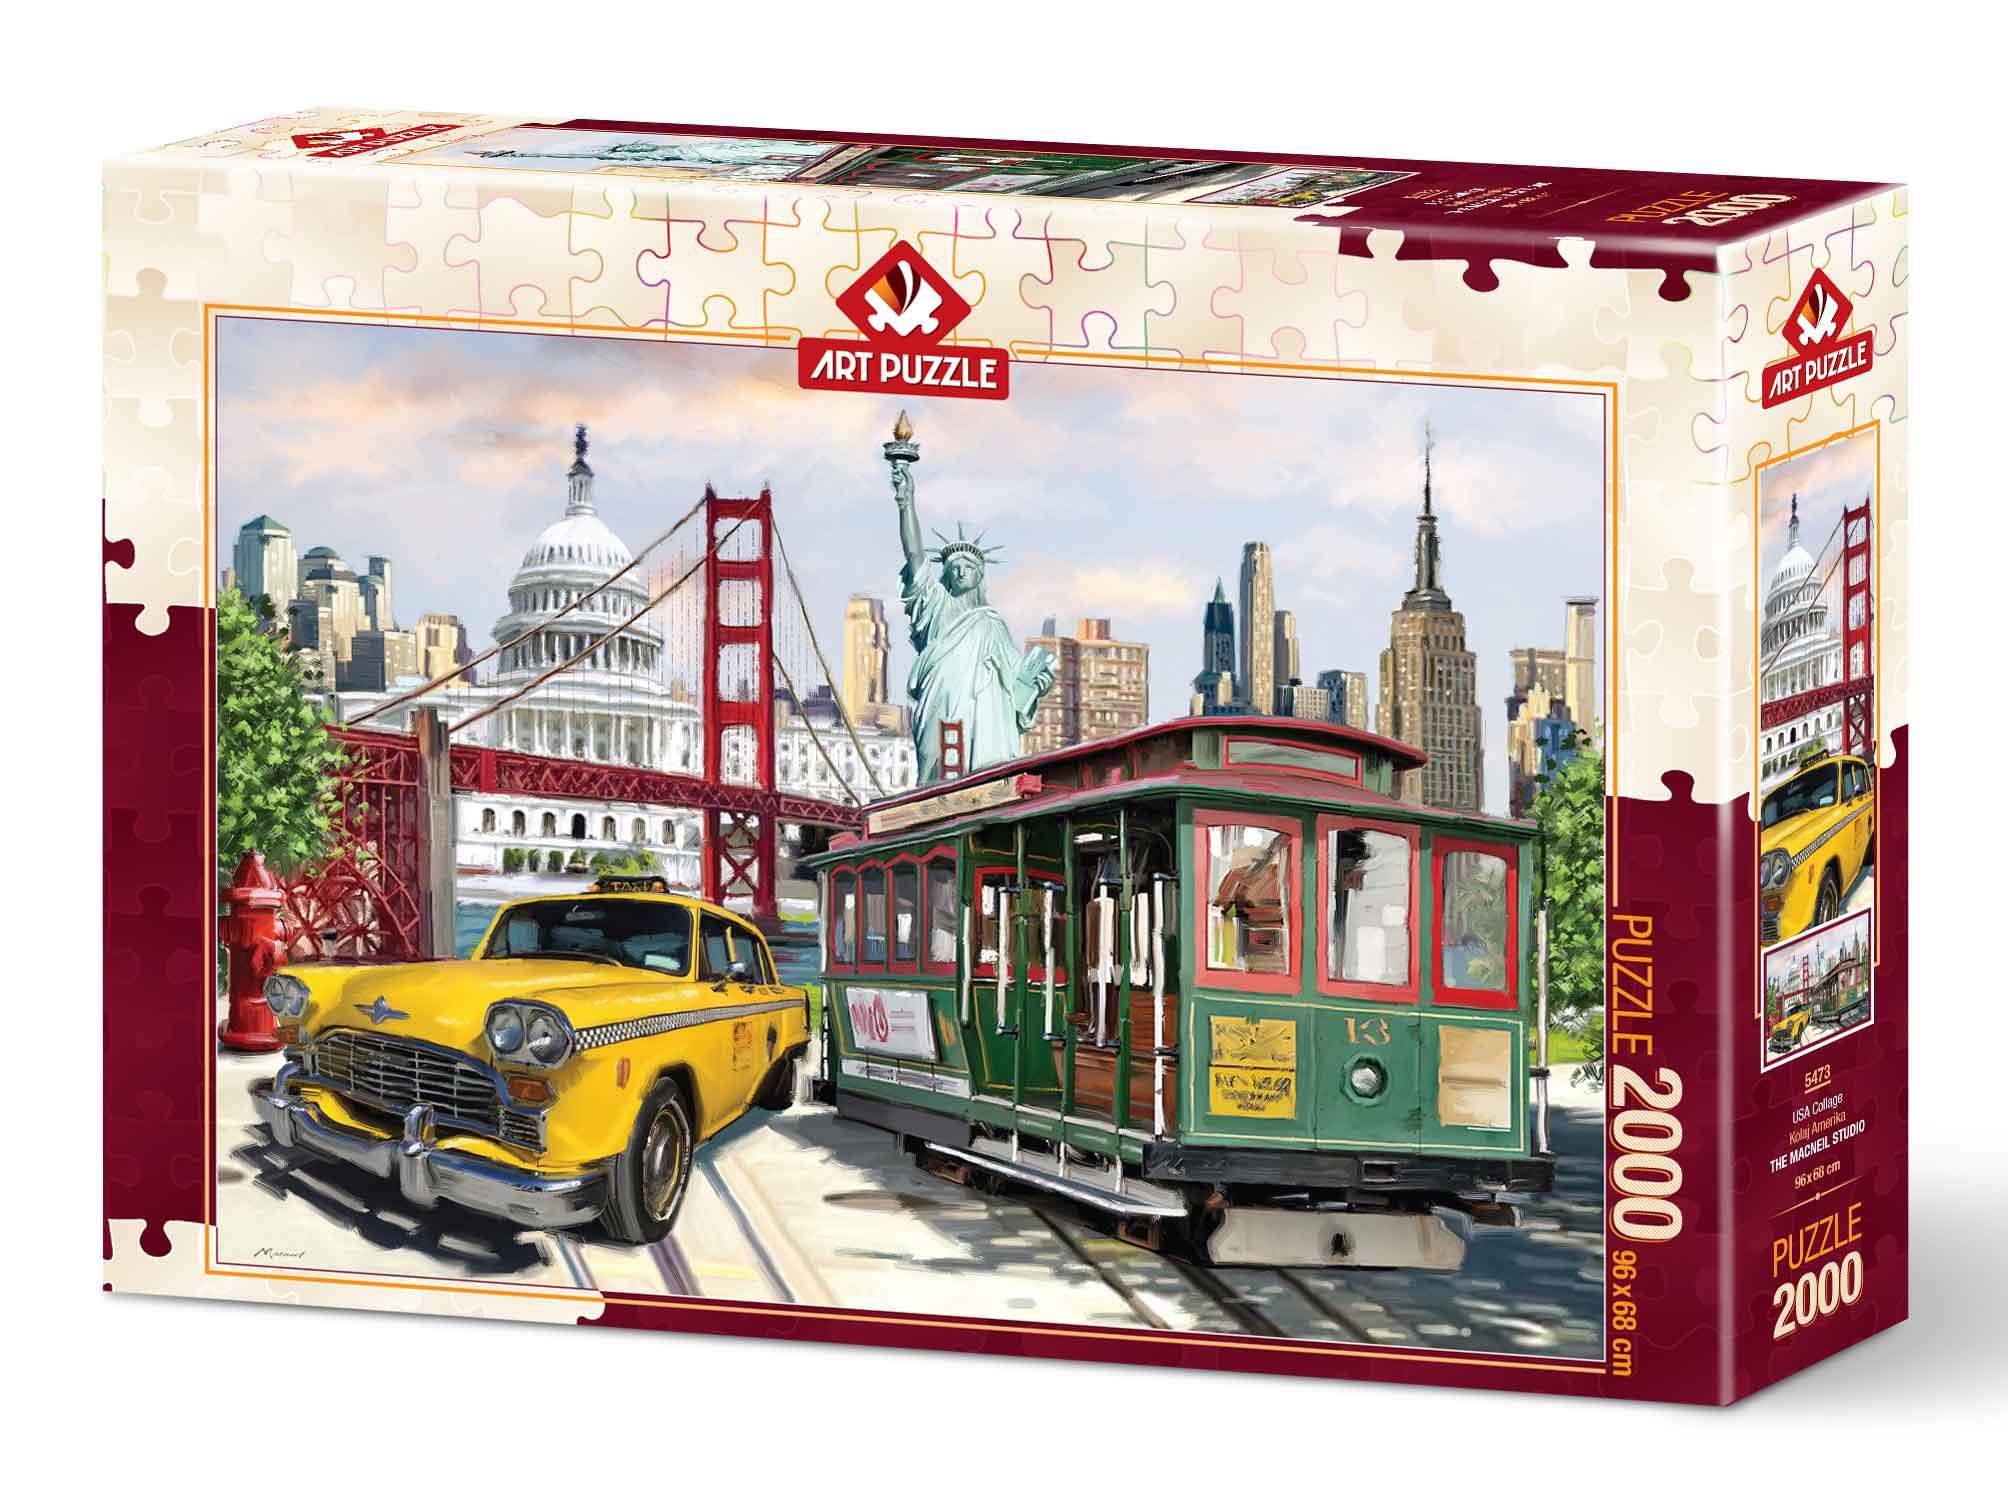 Puzzle Art Puzzle Collage USA de 2000 Piezas